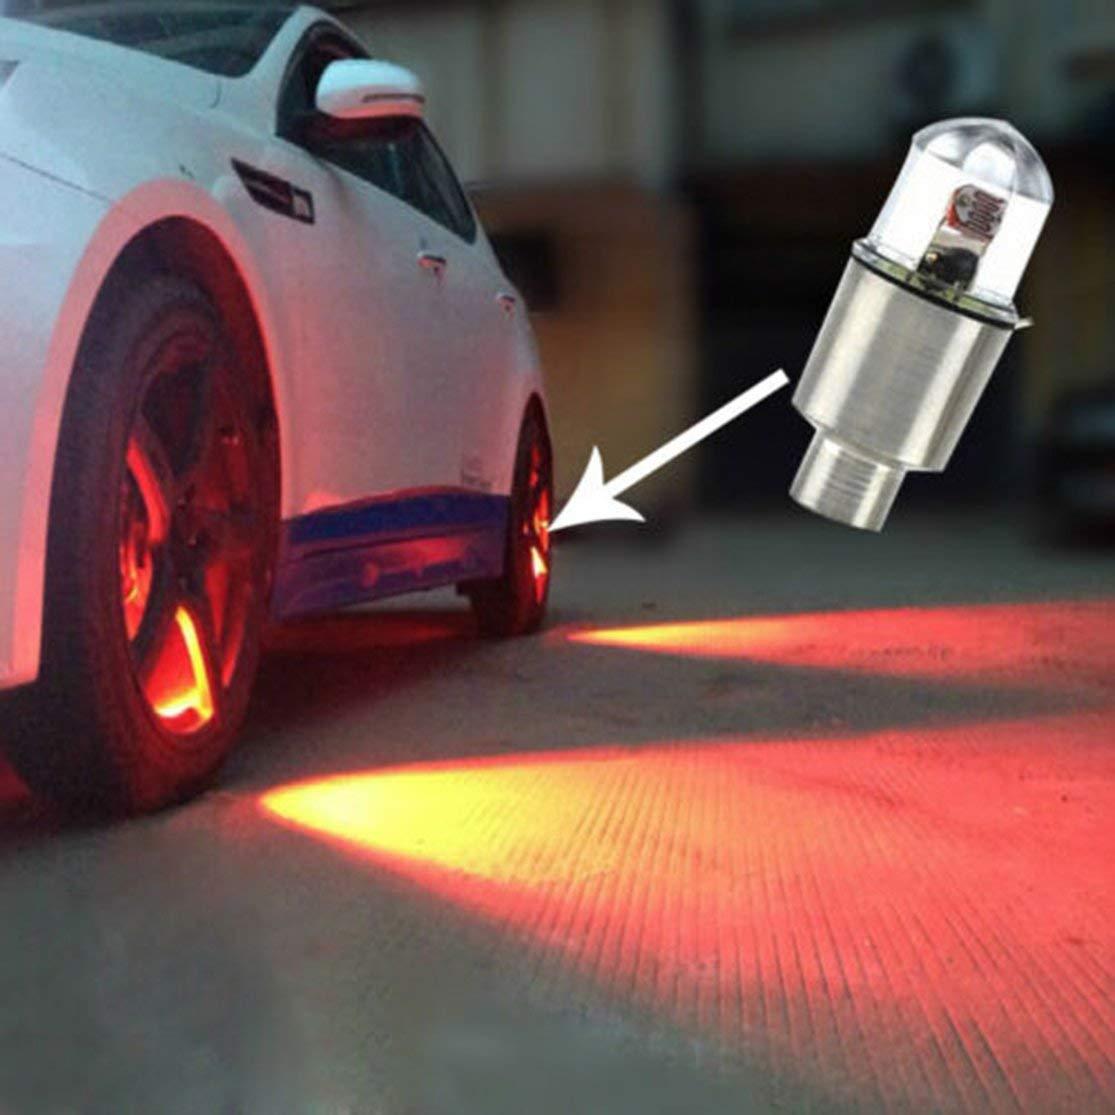 Candybarbar 4X Car Auto SUV Ruota Pneumatico Pneumatico Valvola Aria Stelo Tappi Luminosi a LED Accessori per la Copertura Ruota per Motocicletta a LED Lampada a Raggi di Luce a LED